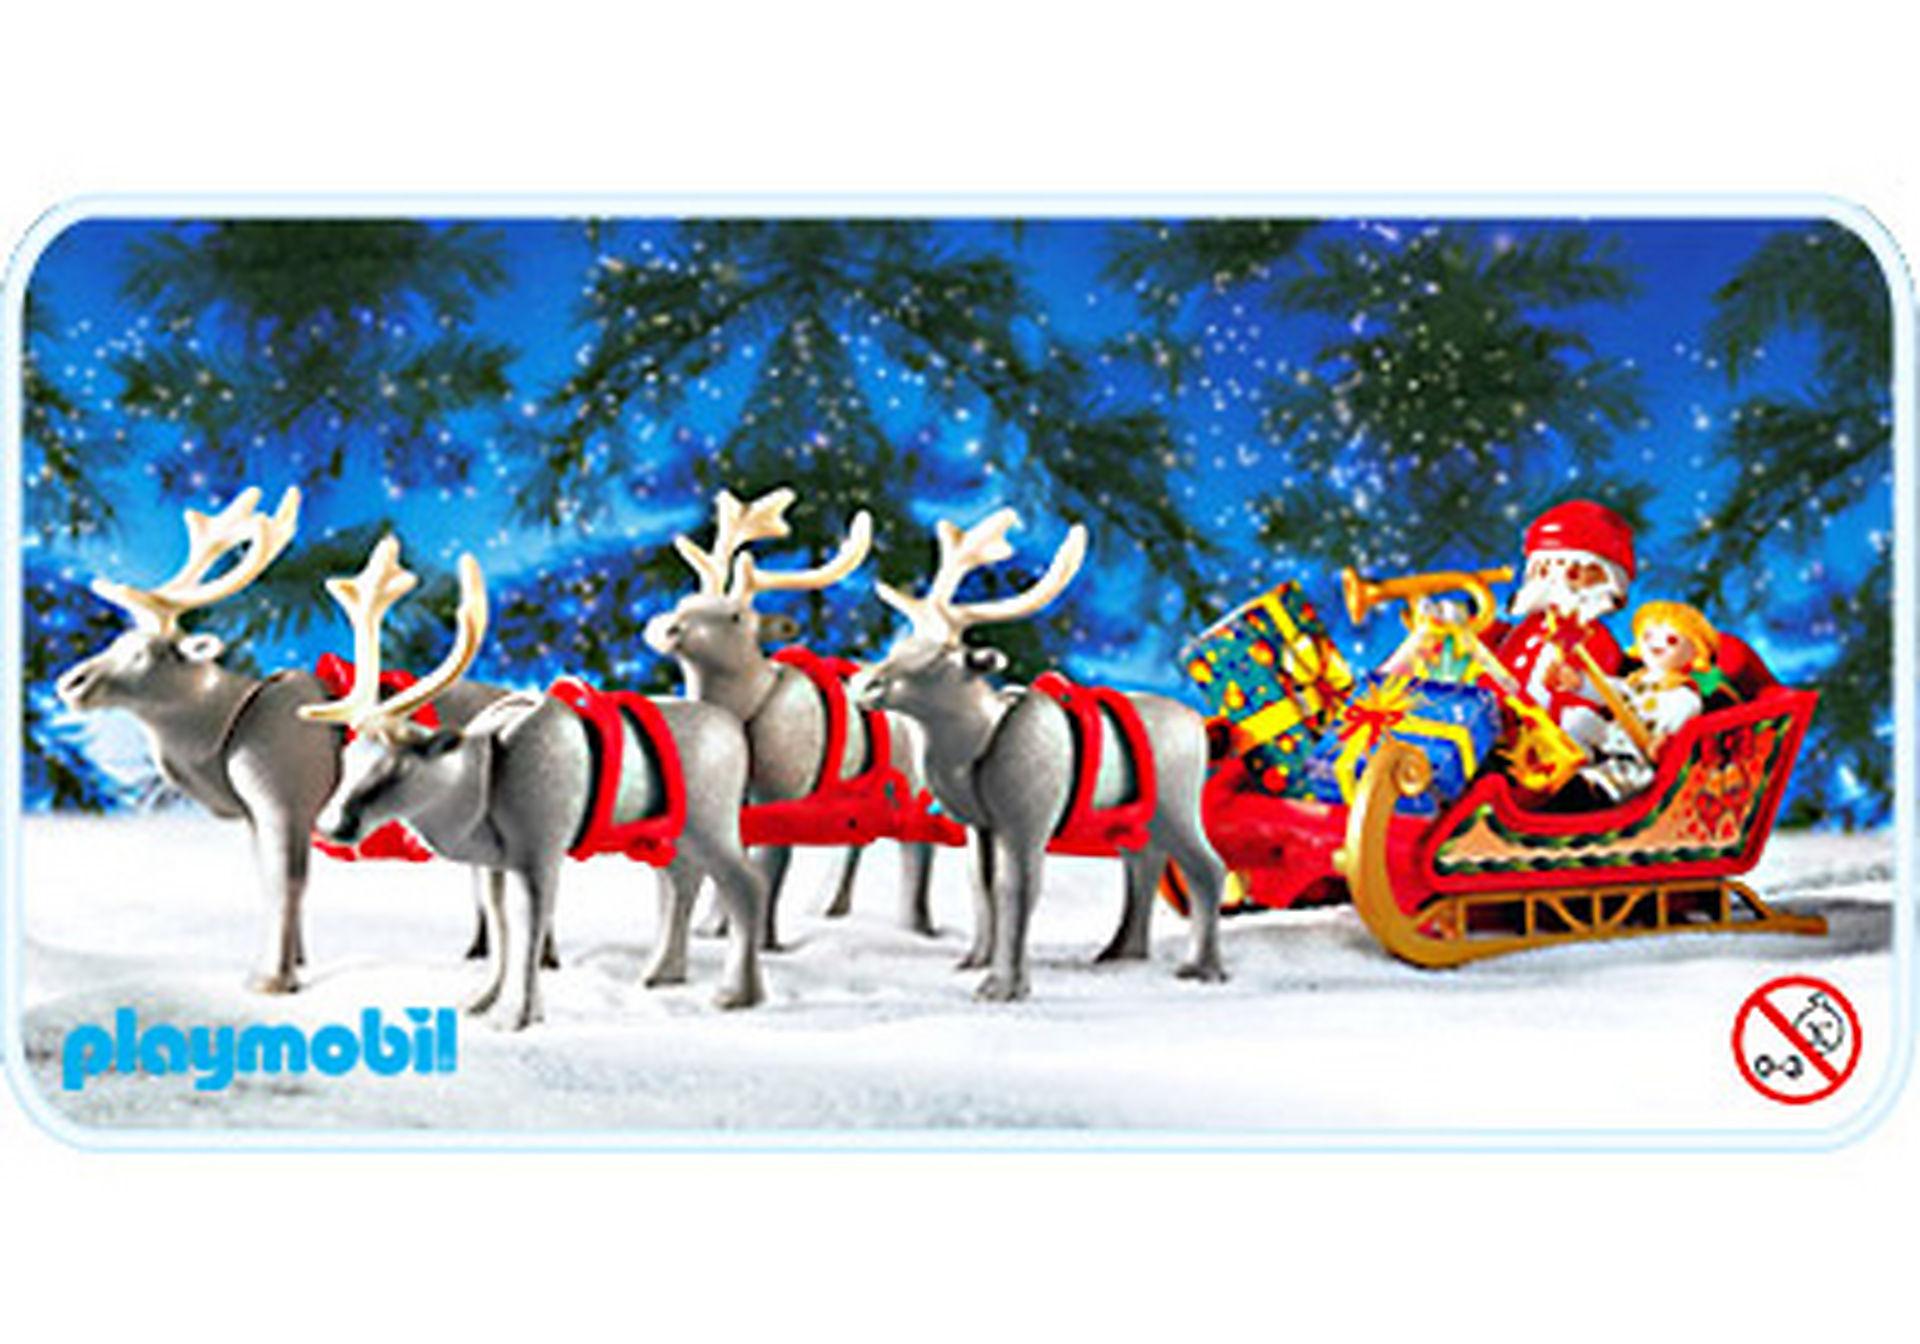 Traineau Pere Noel Playmobil Traîneau du Père Noël   3604 A   PLAYMOBIL® France